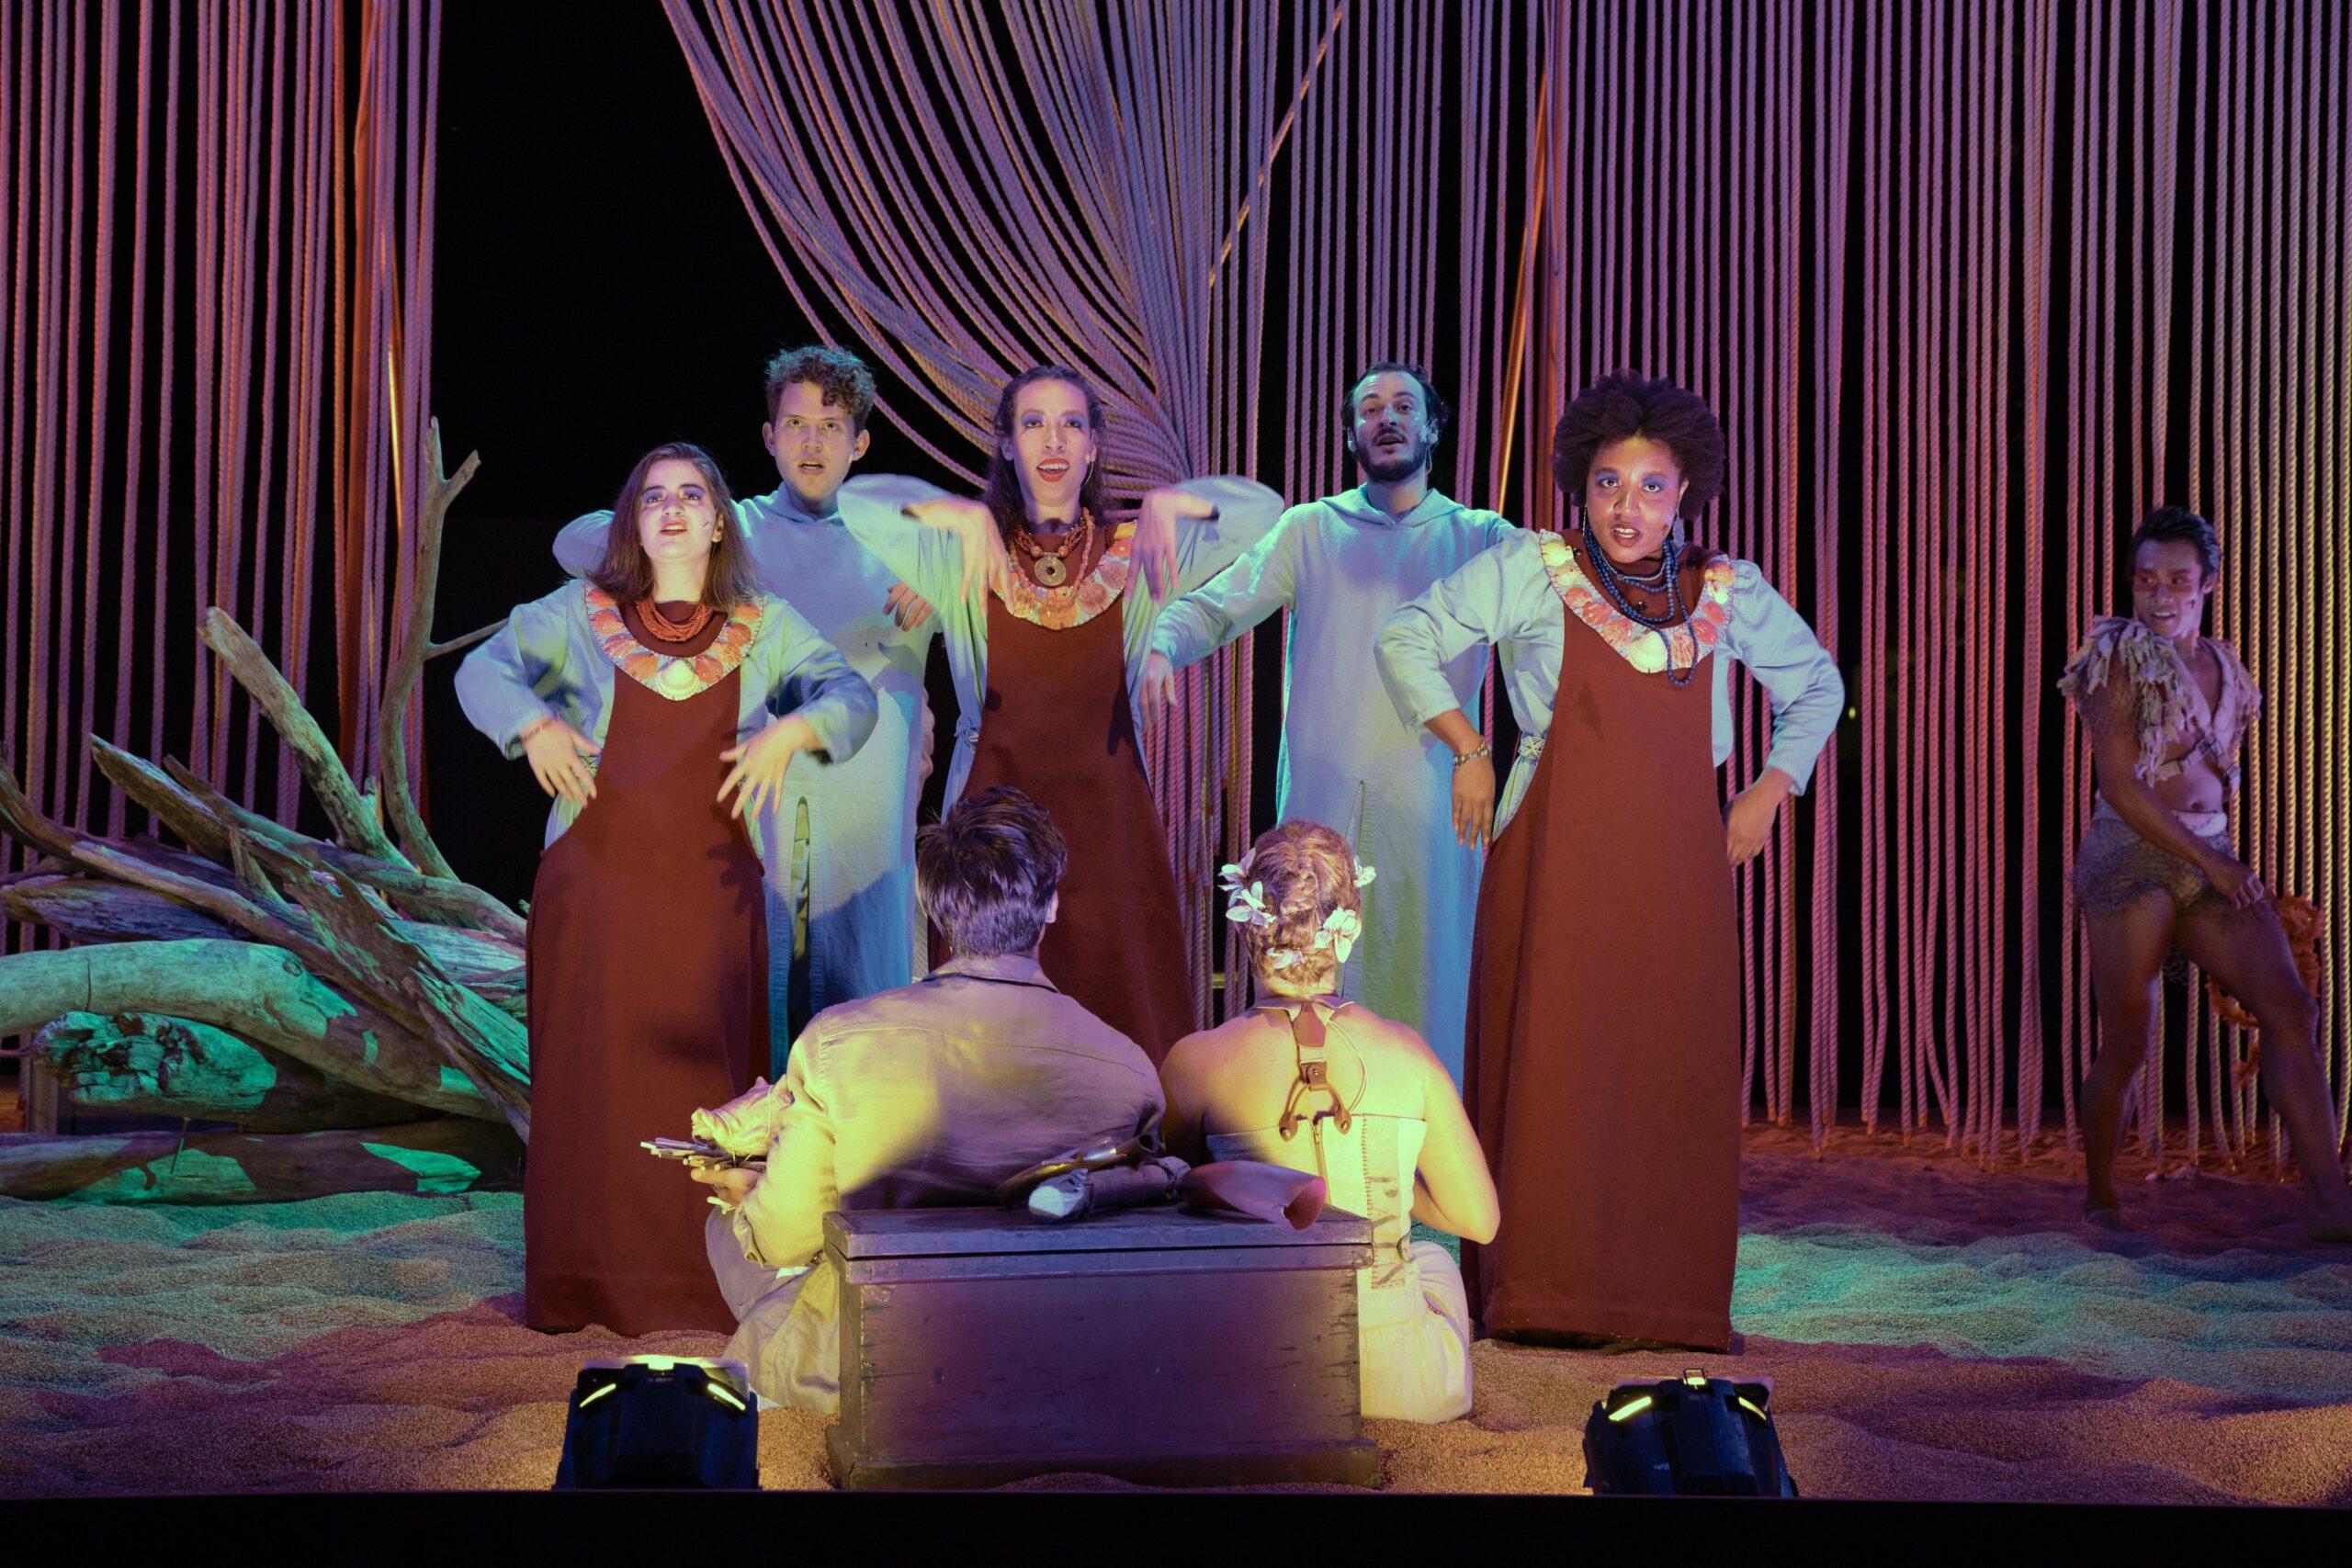 Jessica Golden(Ensemble), Dylan C. Wack (Ensemble), Marta Rymer (Ensemble), Duncan Gallagher (Ensemble), and Ekemini Ekpo (Ensemble) Photo by: Evgenia Eliseeva